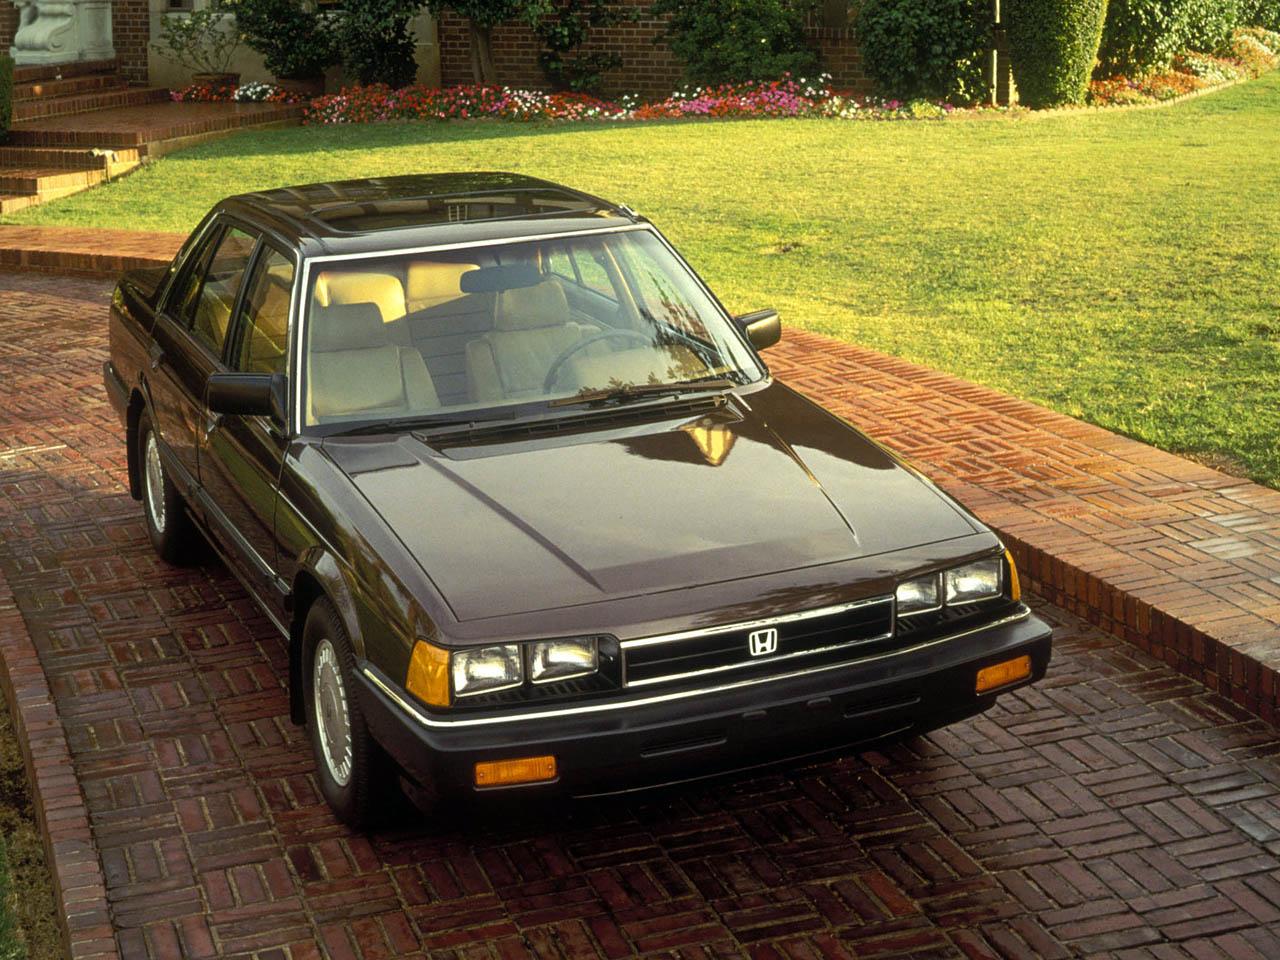 Kelebihan Honda Accord 1982 Murah Berkualitas